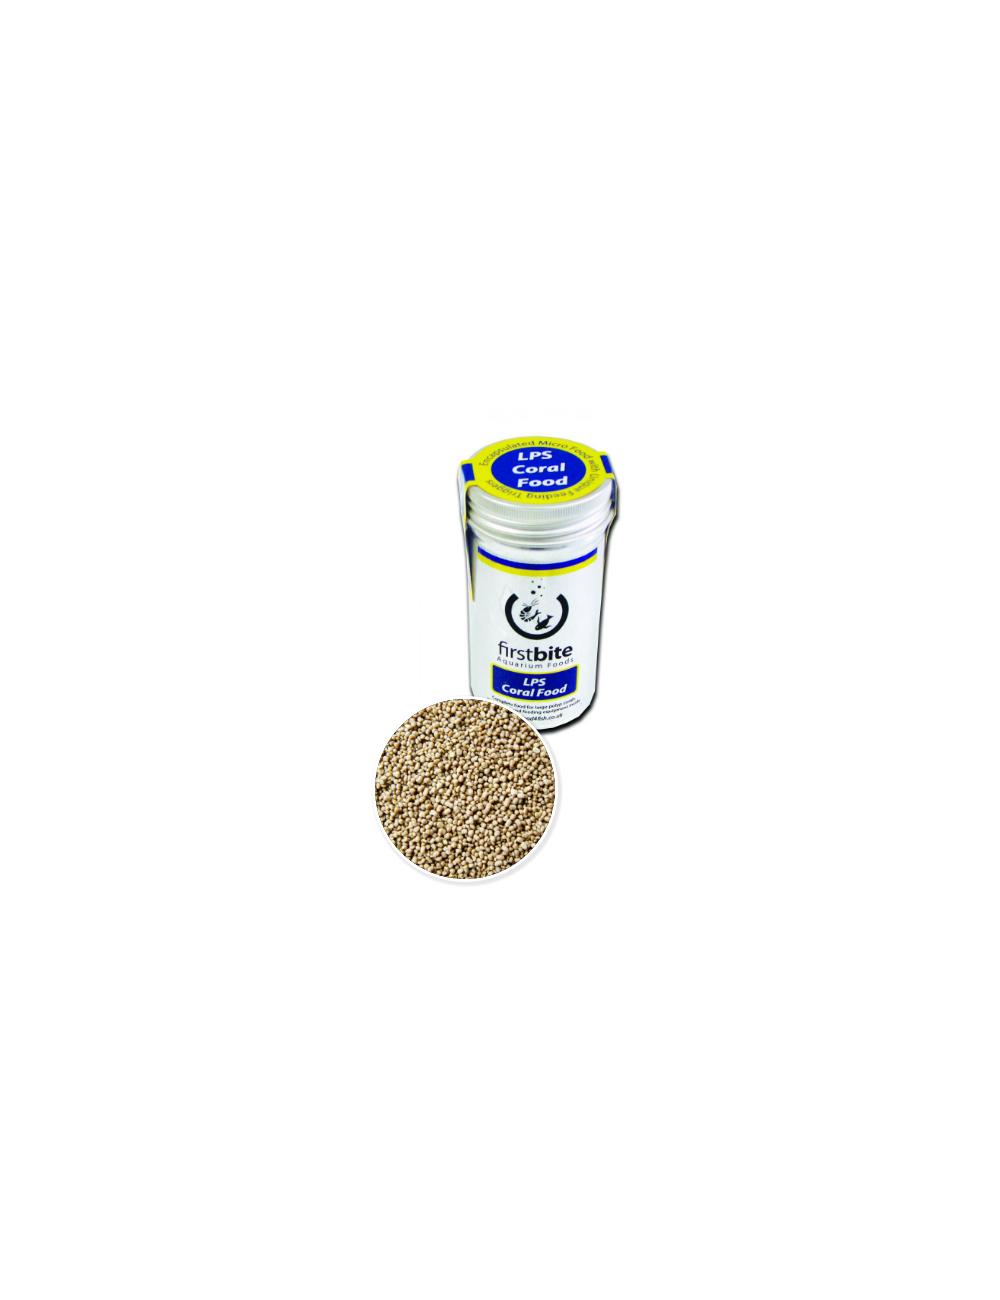 FIRST BITE - Recharge LPS Coral Food - Nourriture pour coraux - 30gr